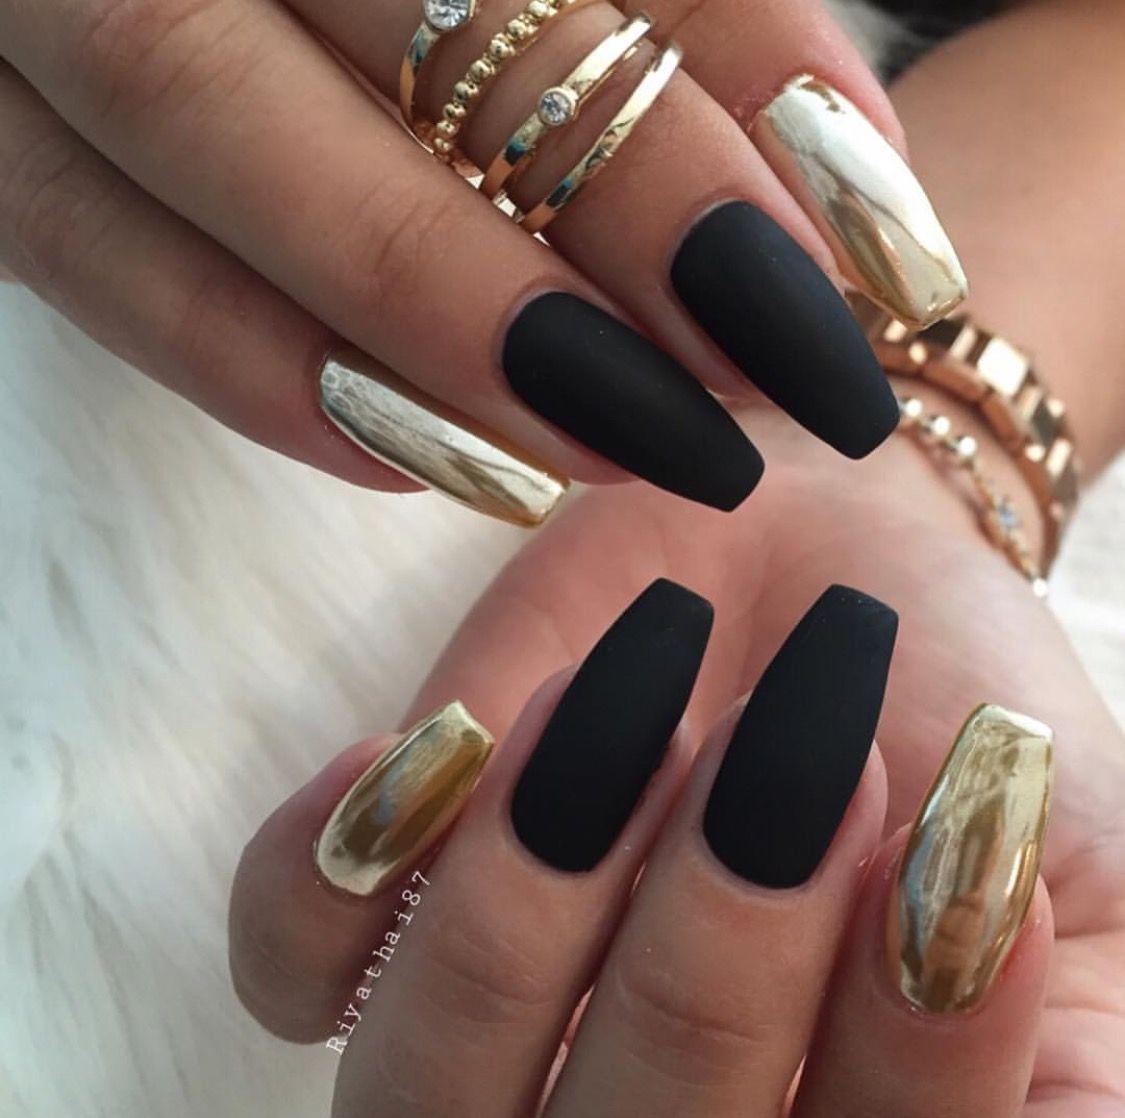 Pin de Alissa Spak en nail salon | Pinterest | Diseños de uñas ...